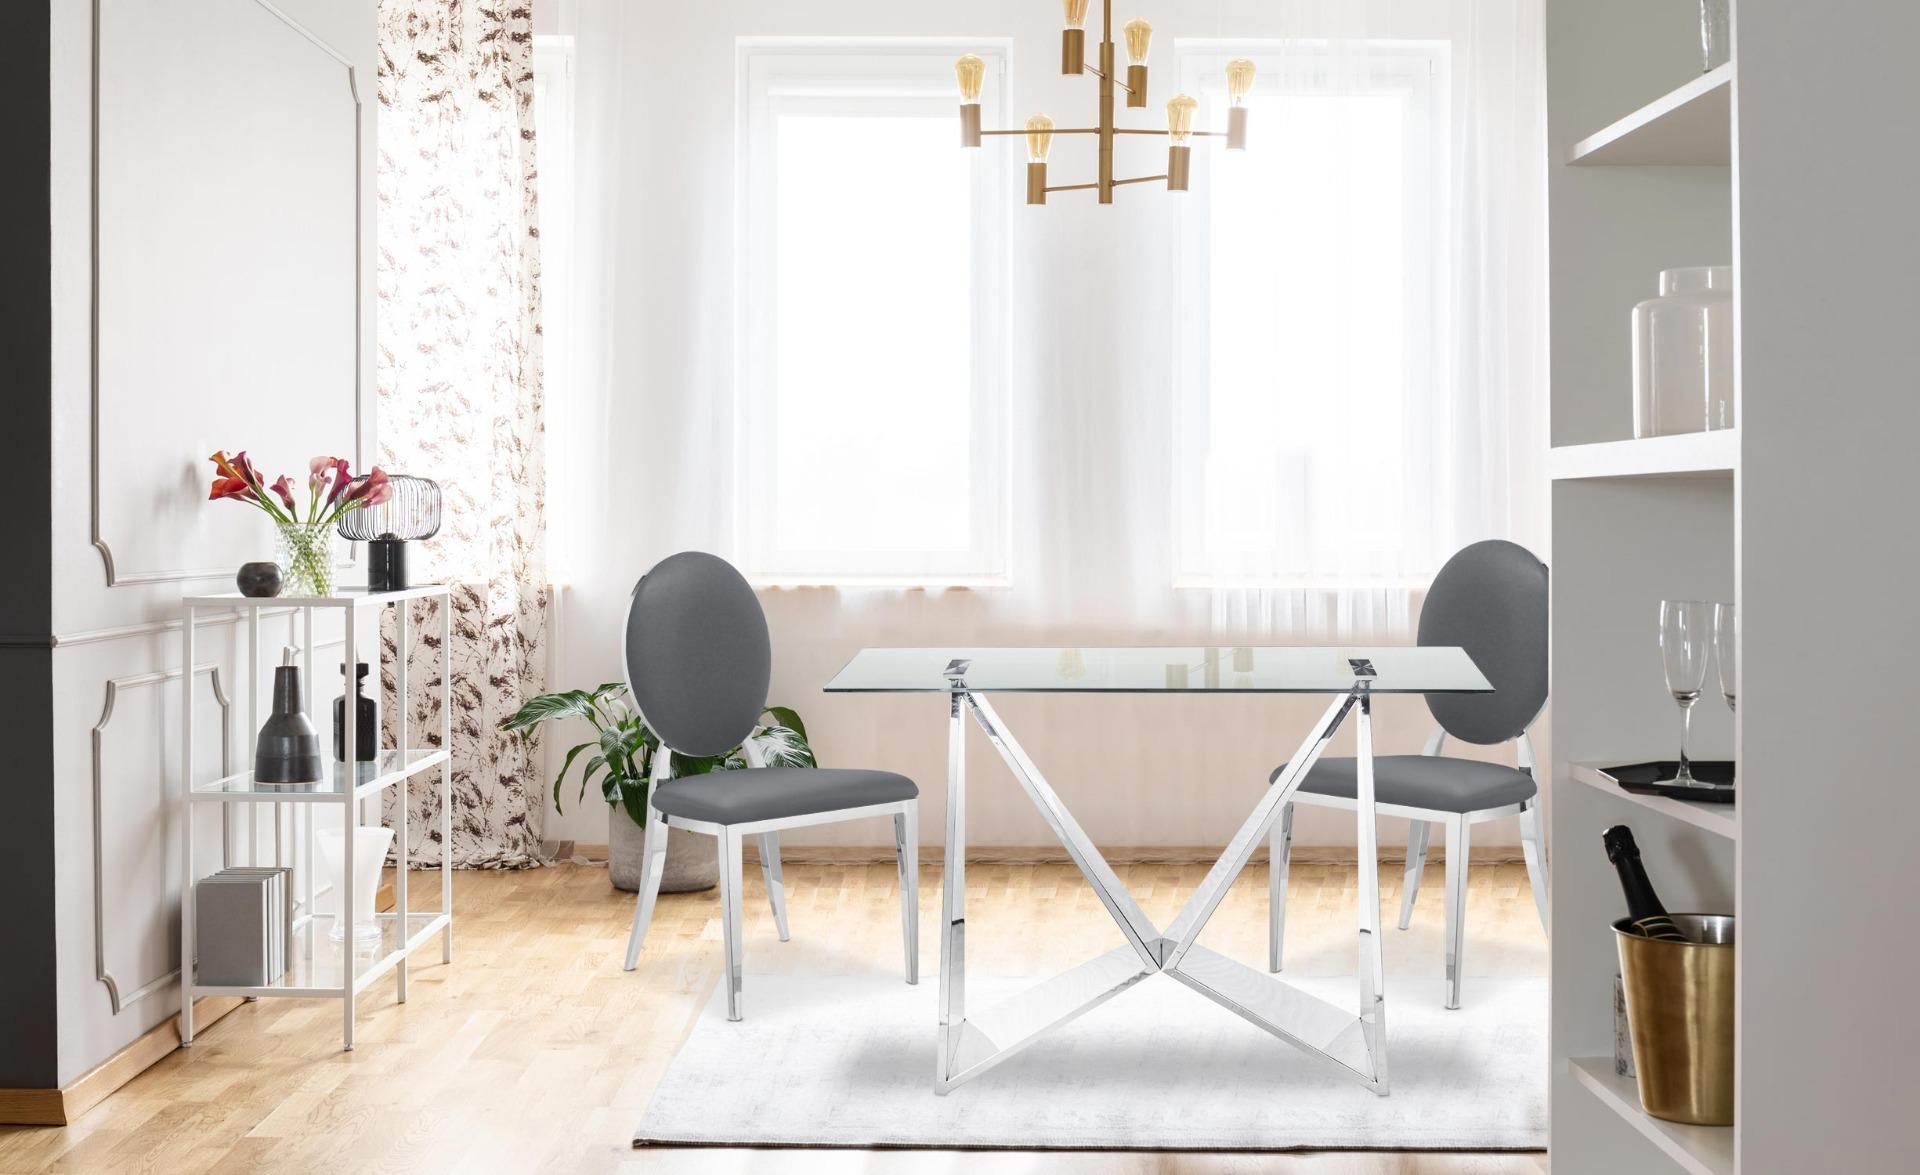 Set di 2 sedie a medaglione Sofia in similpelle grigie